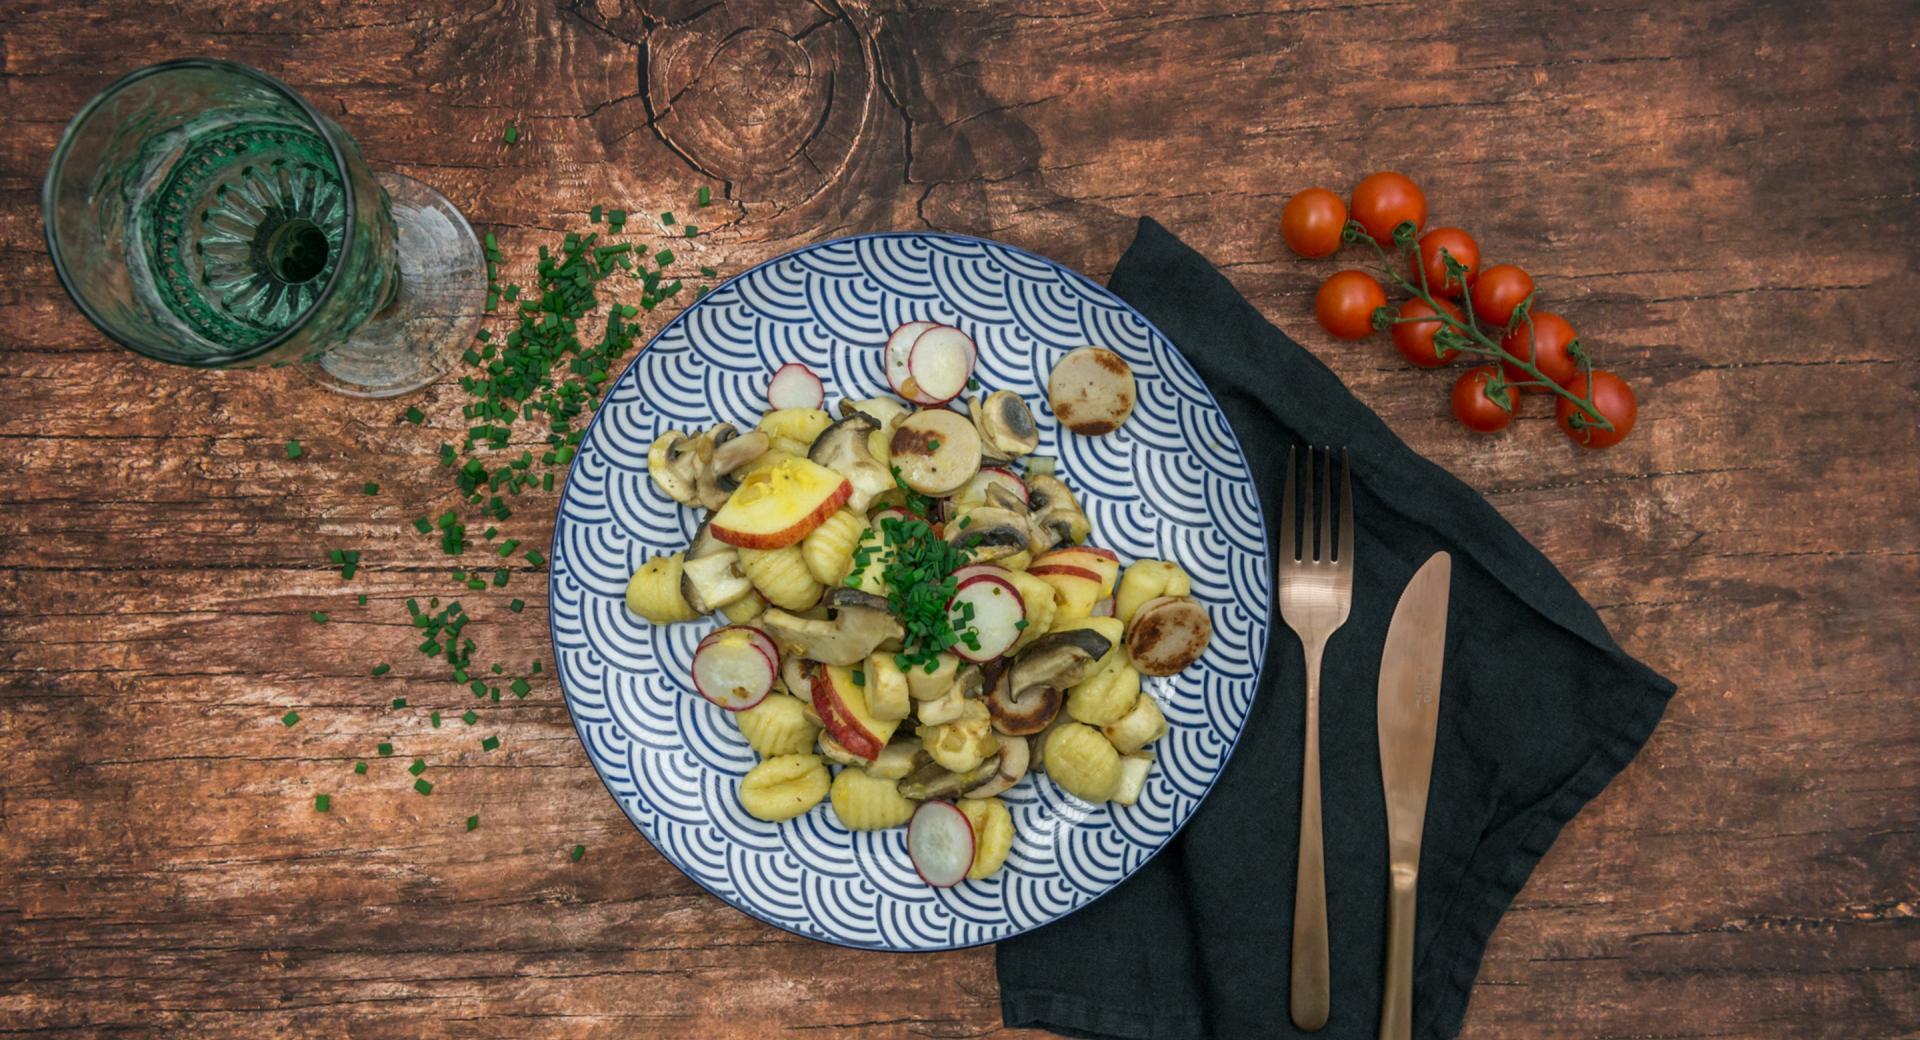 Ensalada de ñoquis, setas y salchichas bratwurst